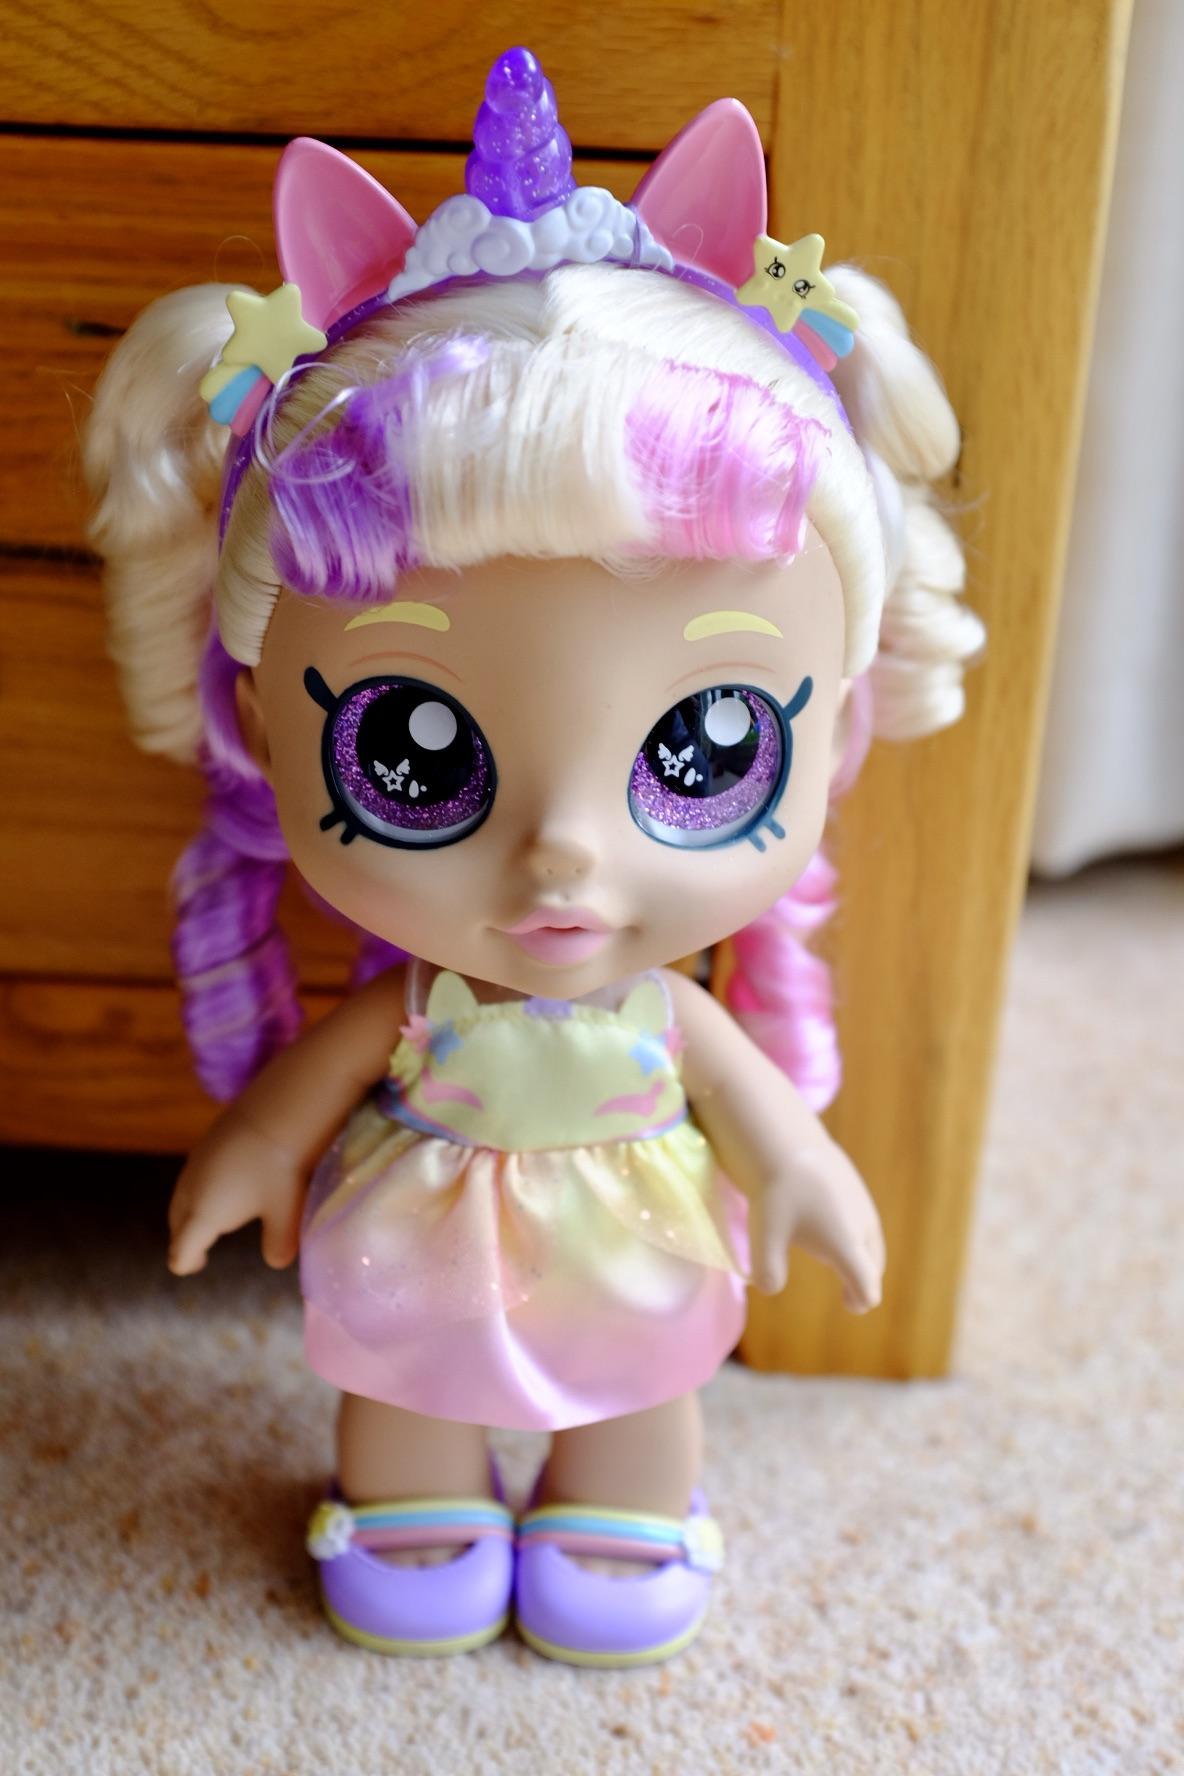 Mystabella kinda kids dress up doll